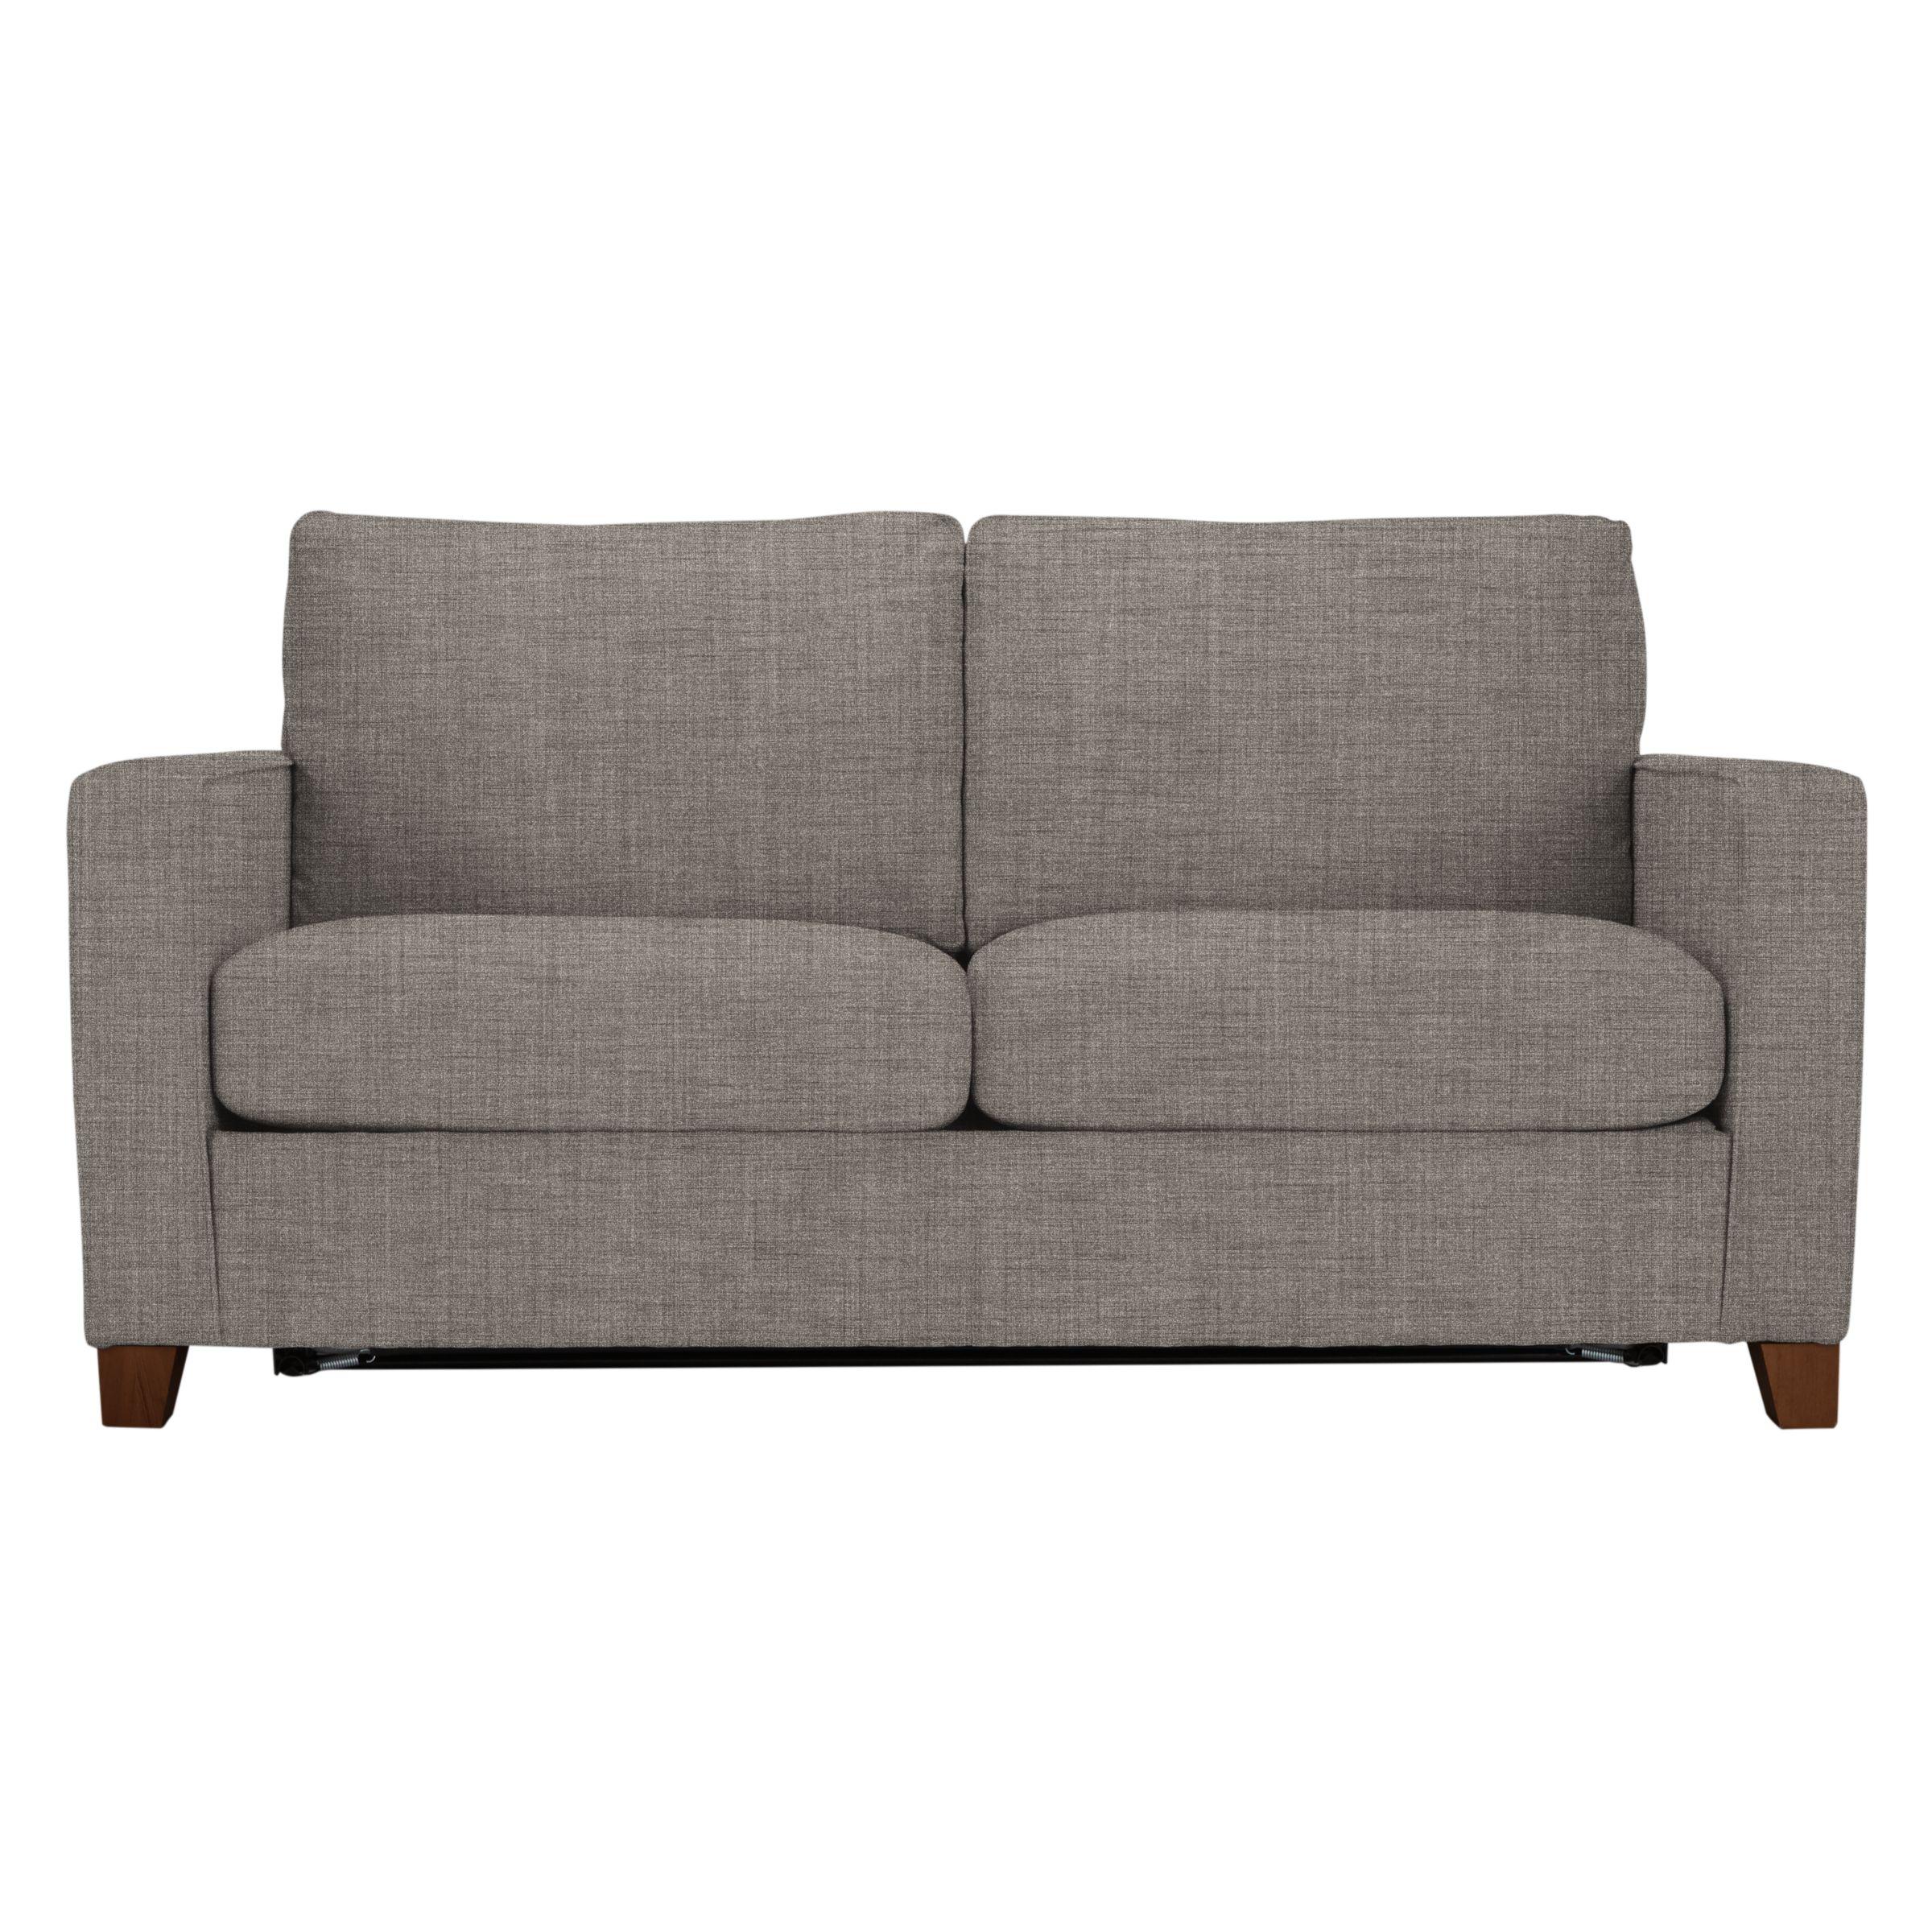 Admirable John Lewis The Basics Jackson Medium 2 Seater Sofa Bed Dark Ibusinesslaw Wood Chair Design Ideas Ibusinesslaworg